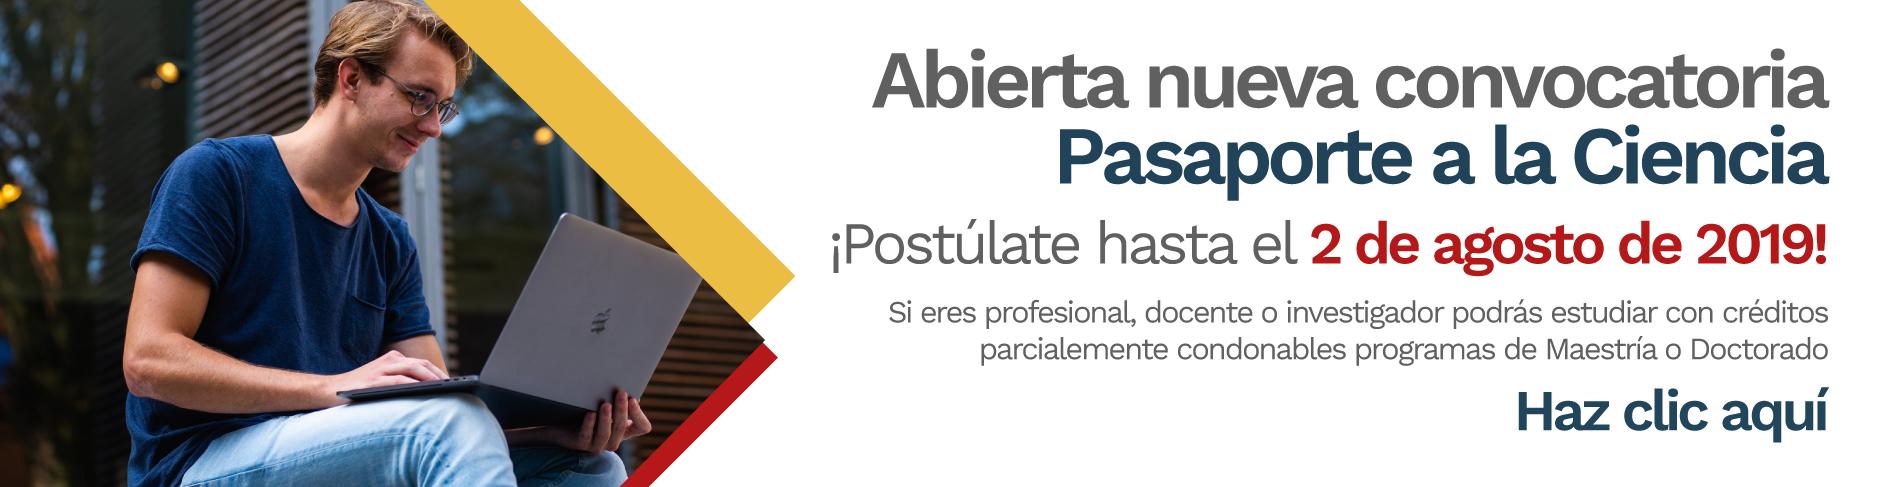 Segunda convocatoria «Pasaporte a la Ciencia» 2019 (Colombia Científica)